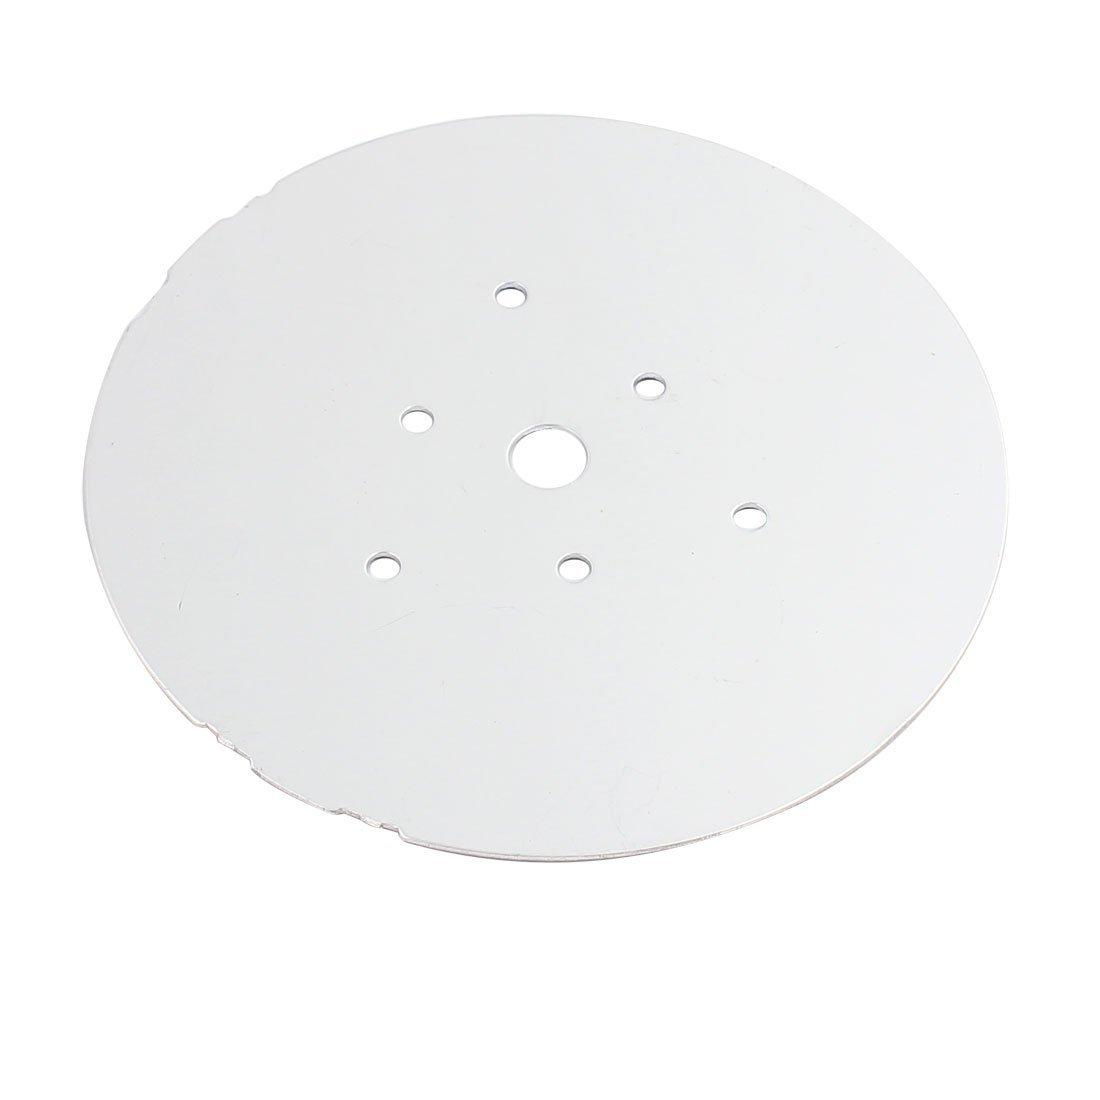 eDealMax 119mm Dia 18W 36 LED 5730 SMD LED Blanco Puro de techo Junta de aluminio ligero: Amazon.com: Industrial & Scientific